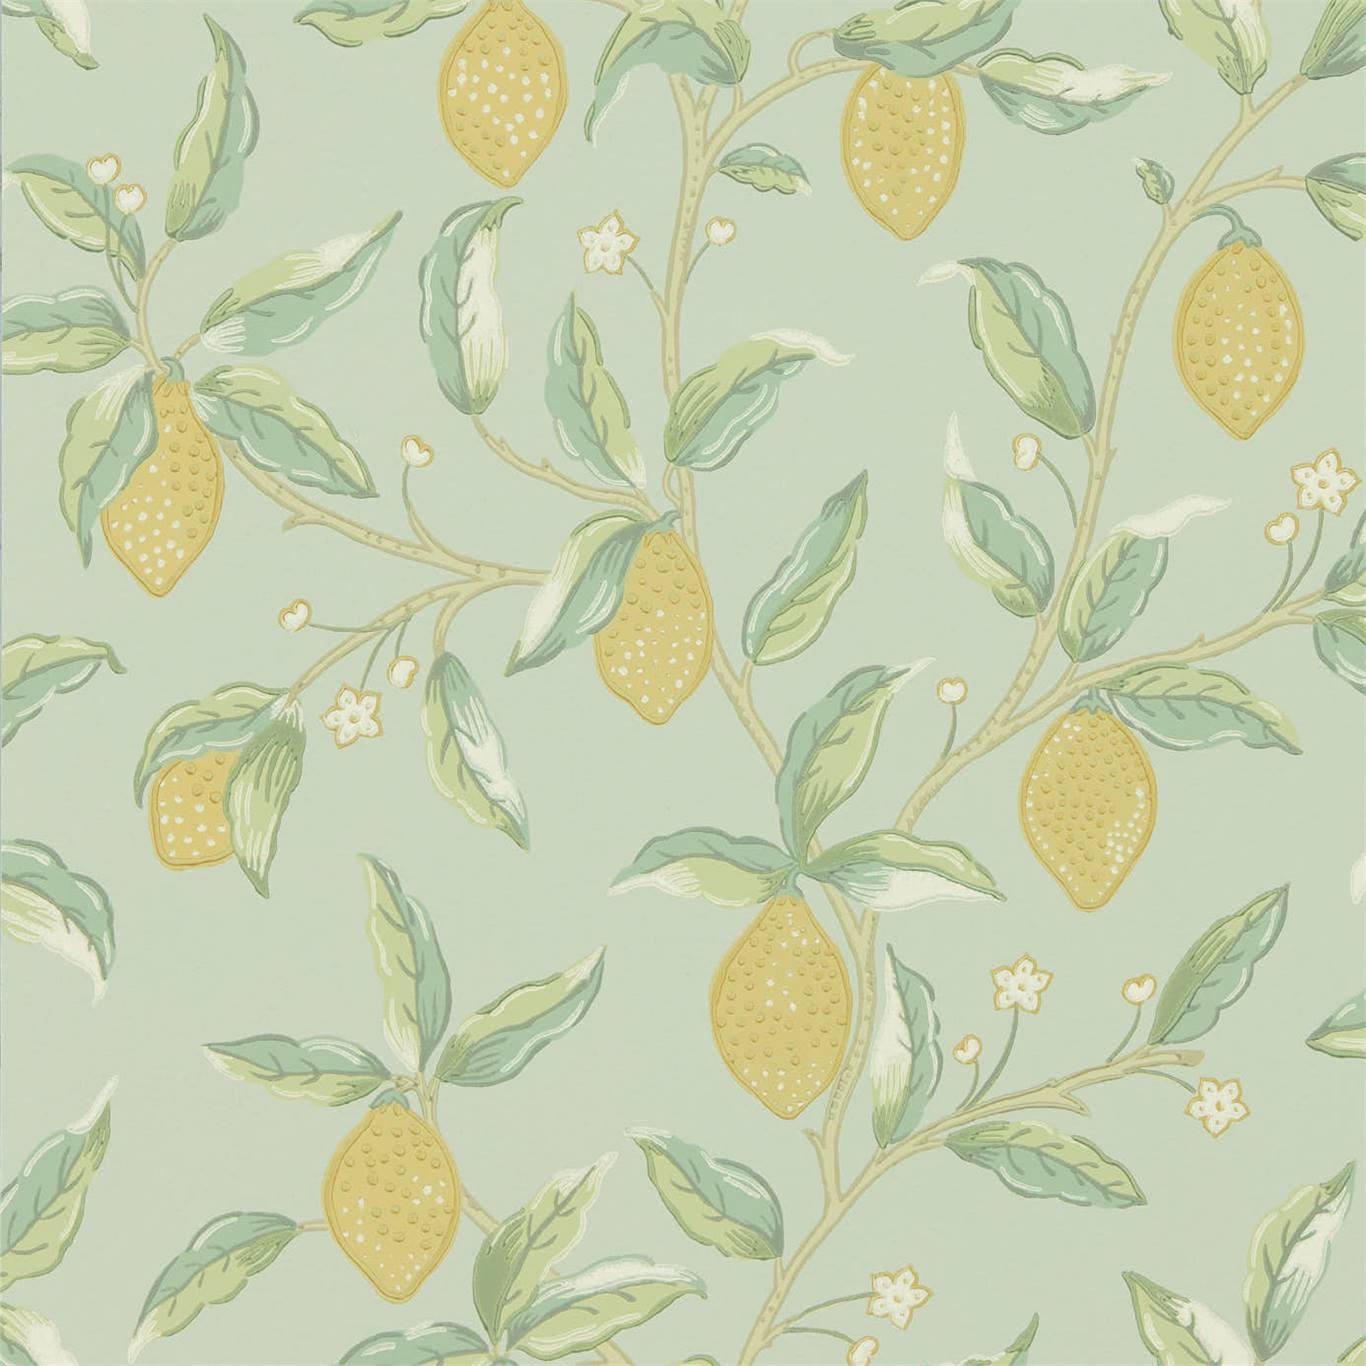 Tapet William Morris Lemon Tree 216673